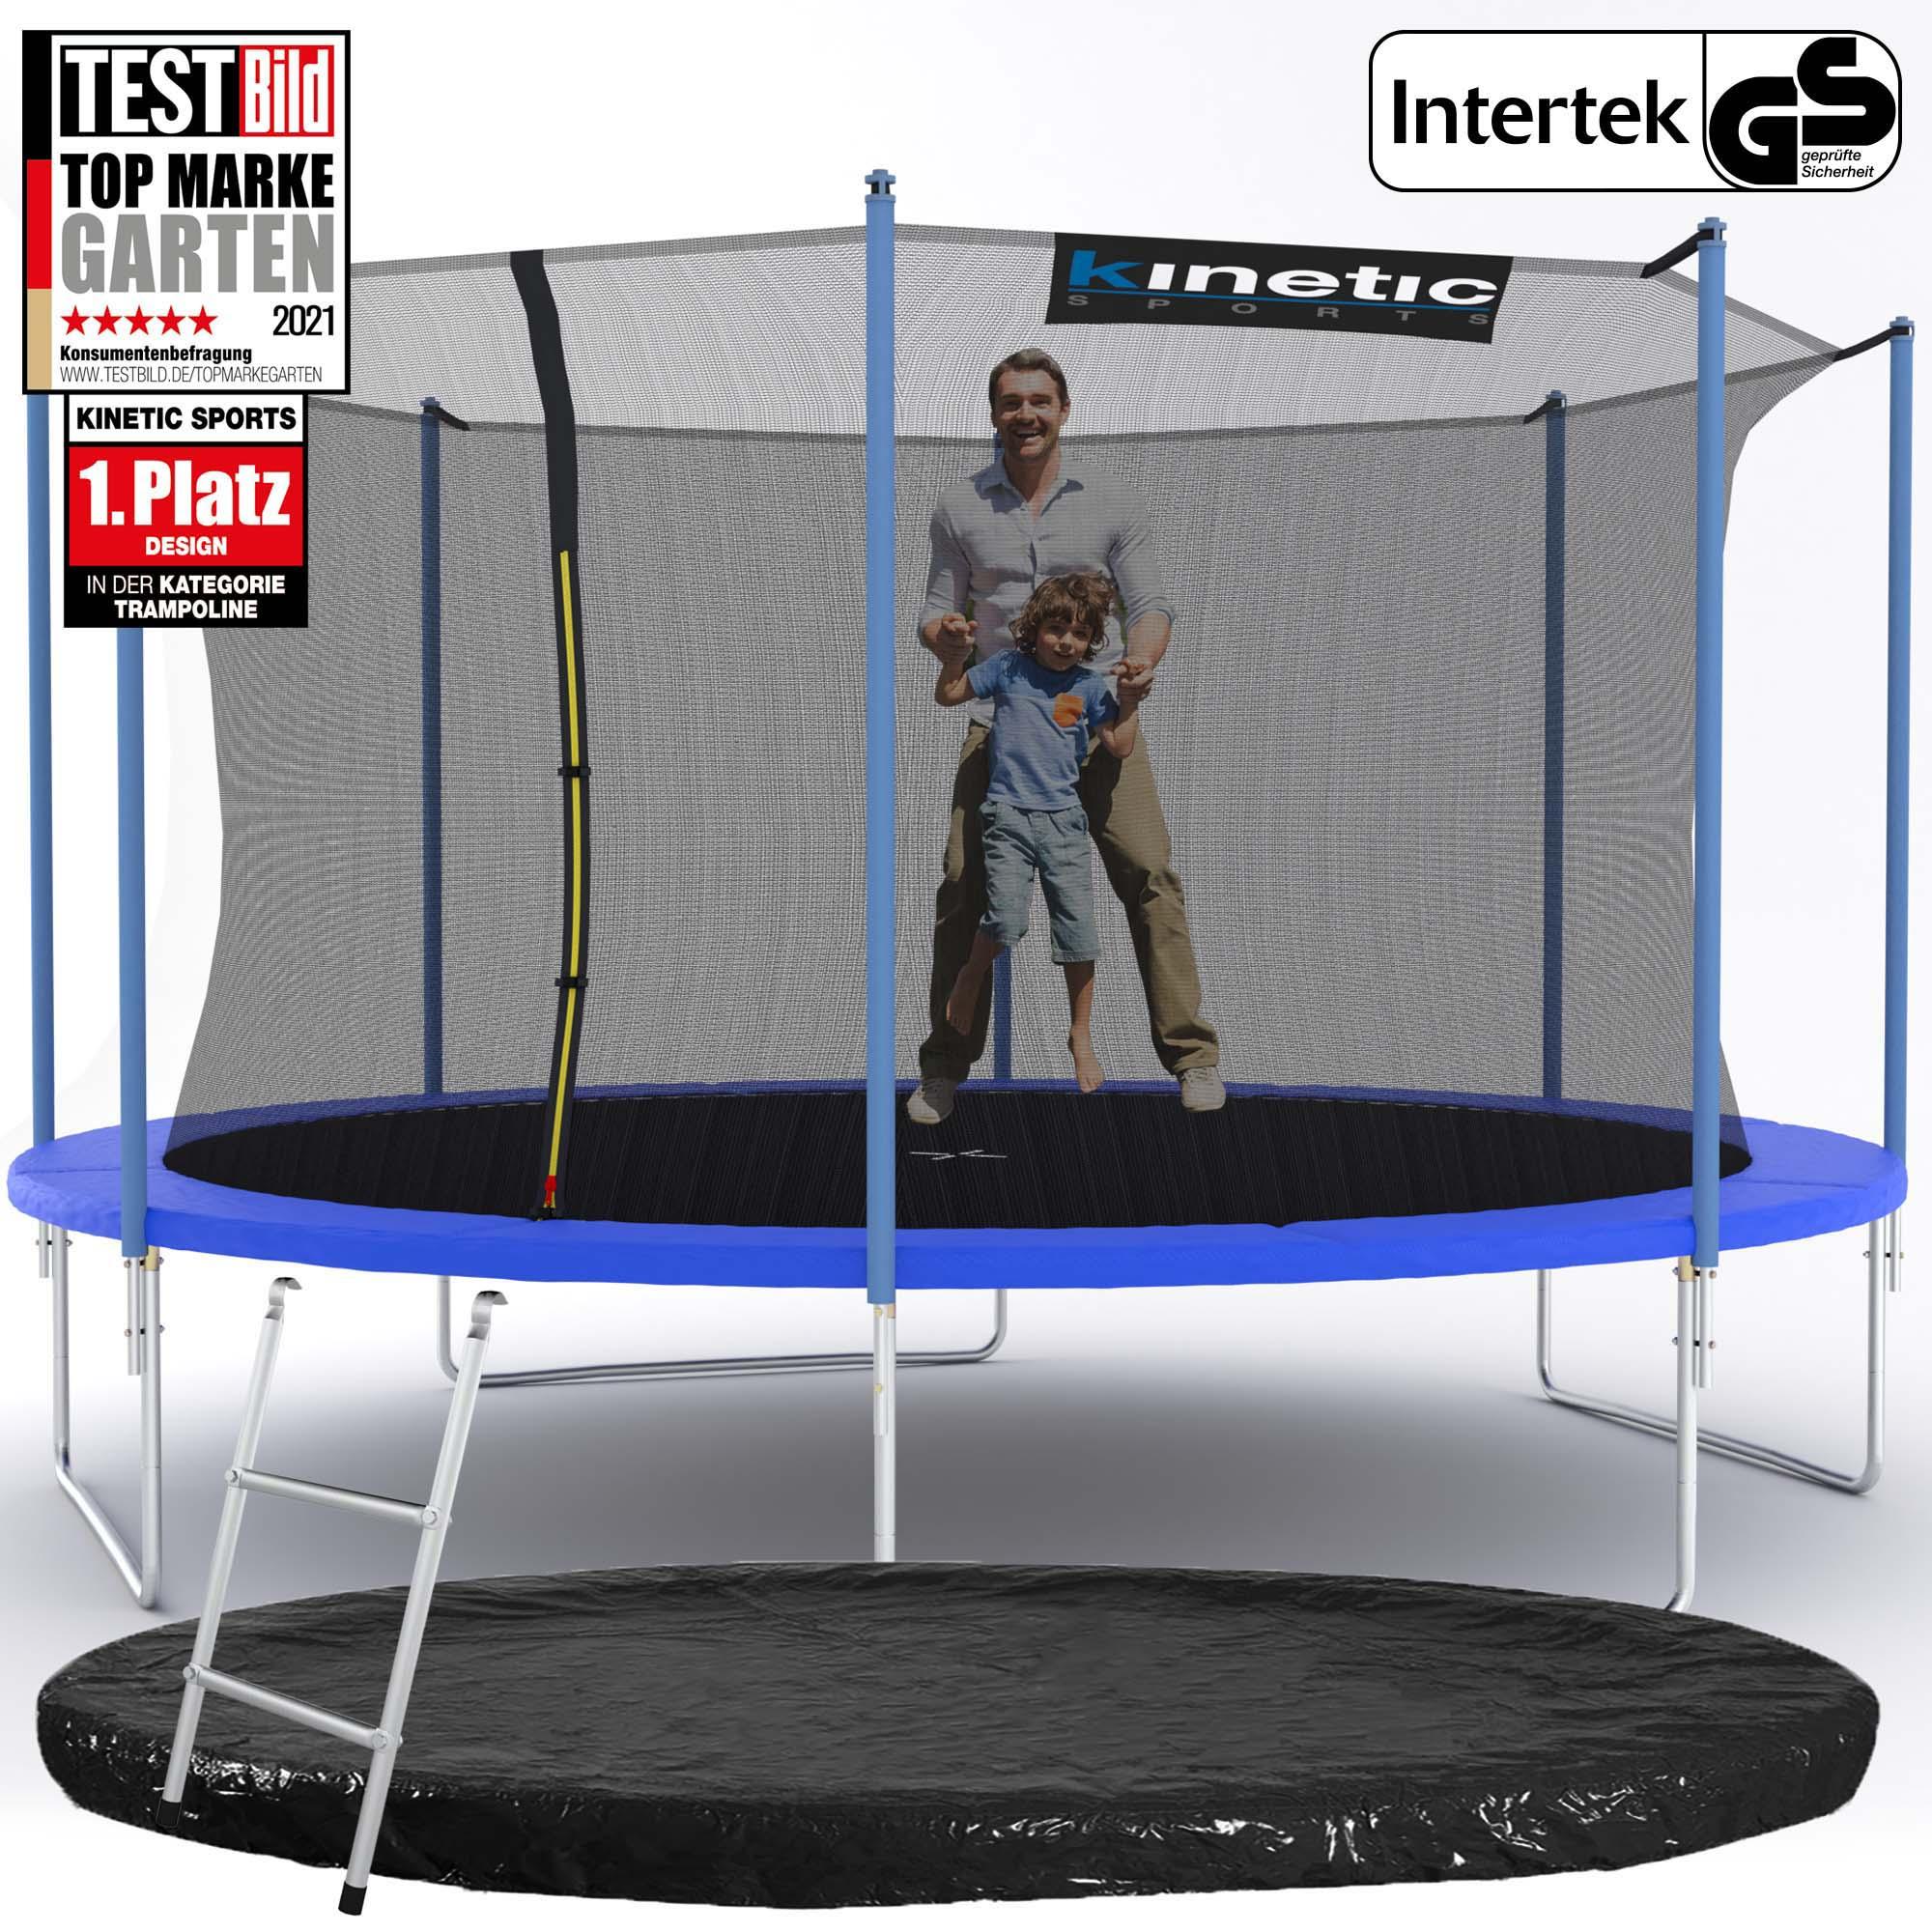 trampolin komplett set netz randabdeckung leiter abdeckplane outdoor garten ebay. Black Bedroom Furniture Sets. Home Design Ideas